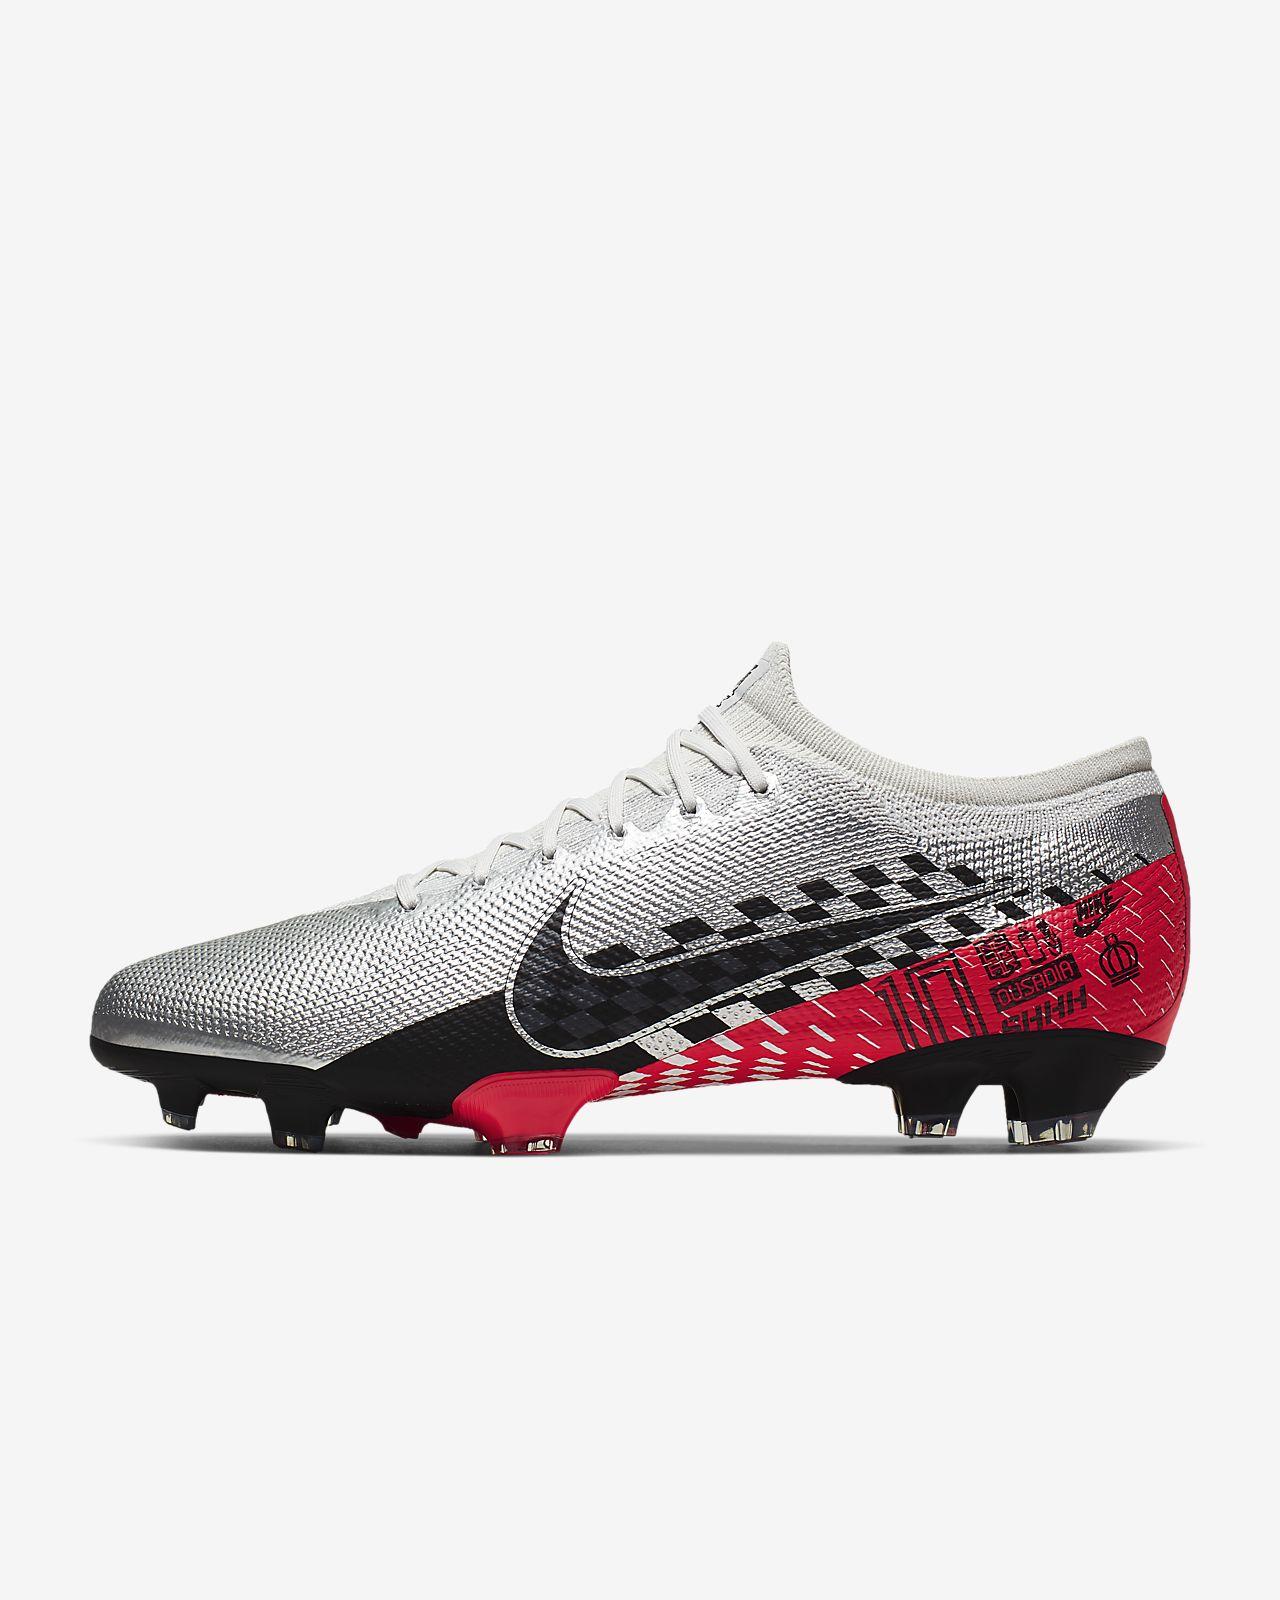 Nike Mercurial Vapor 13 Pro Neymar Jr. FG Voetbalschoen (stevige ondergrond)